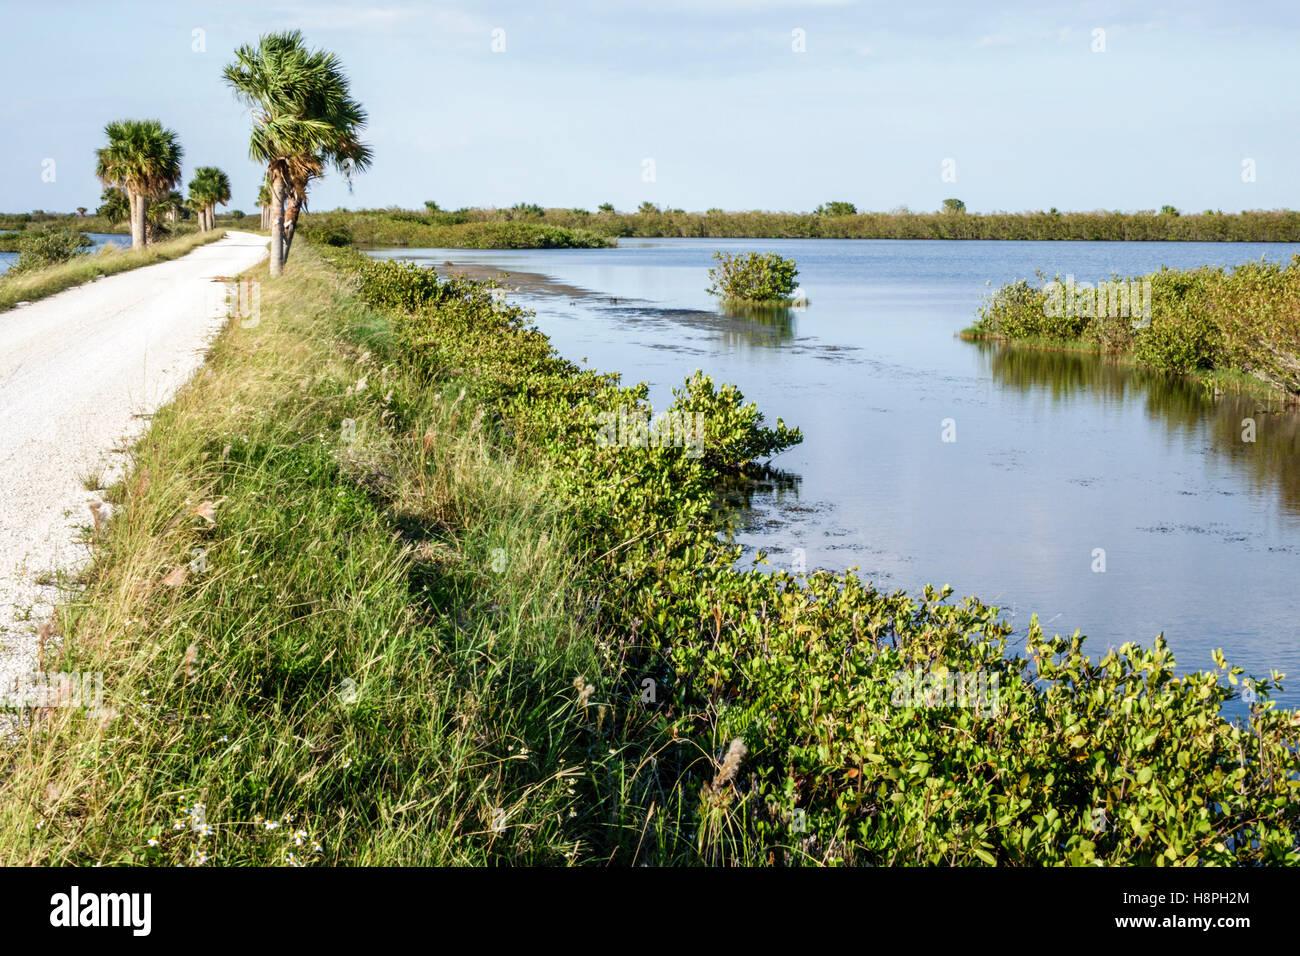 Florida Merritt Island Merritt Island National Wildlife Refuge Schwarz Punkt Wildlife fahren Wasser Landschaft Stockfoto